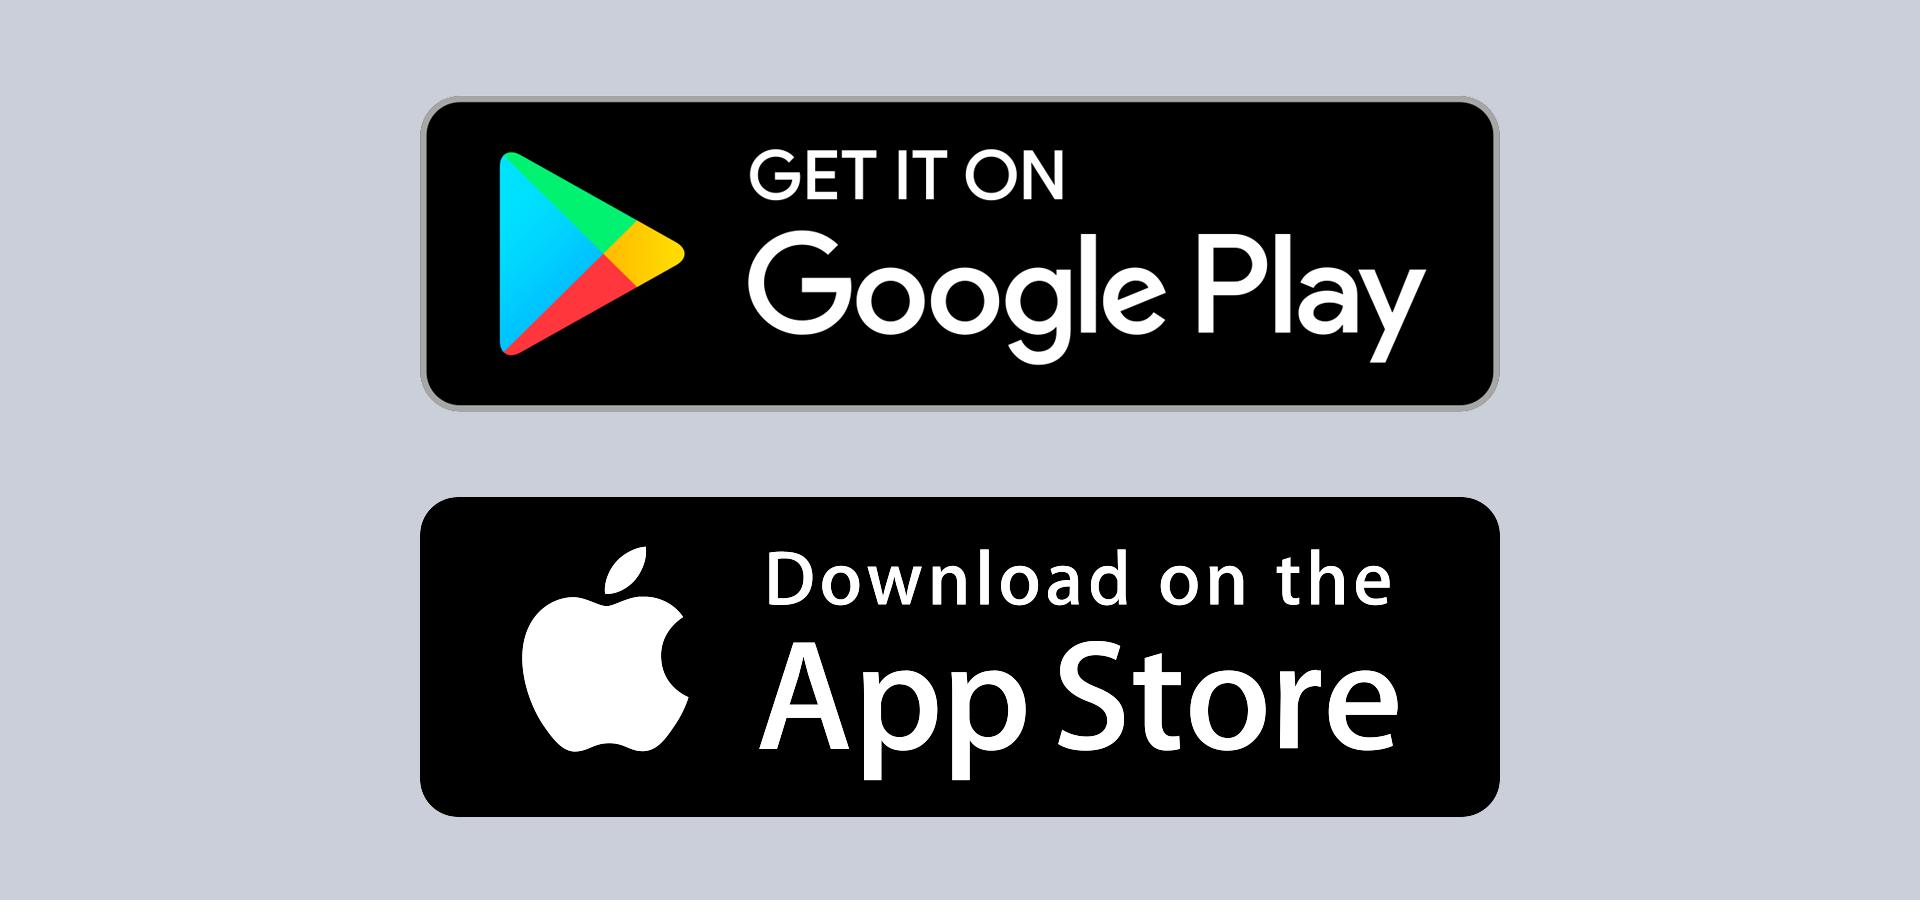 appstore-seo-im-mobile-marketing